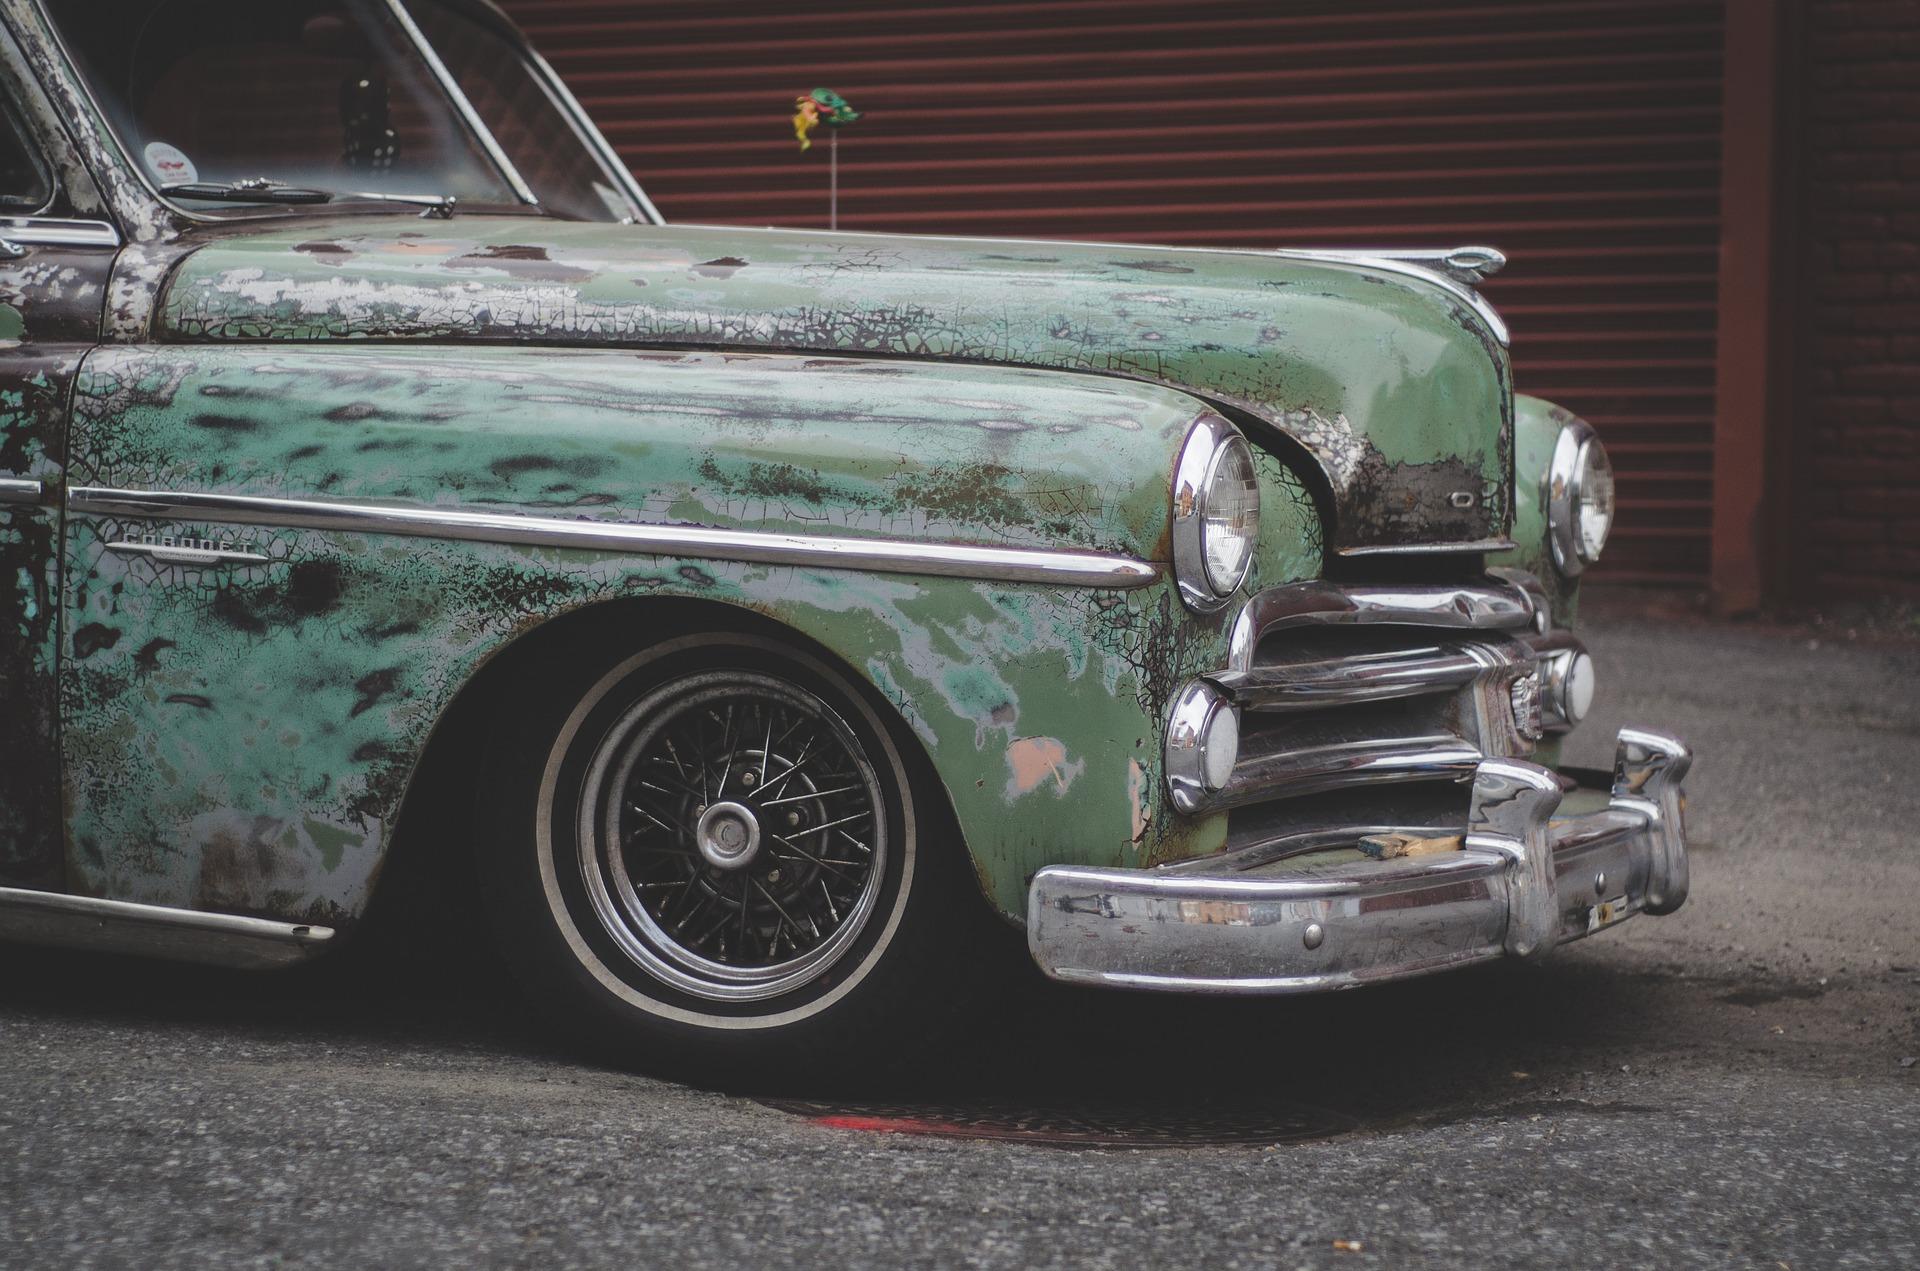 auto, vintage, Classic, retrò, vecchio, sporco, automobile - Sfondi HD - Professor-falken.com